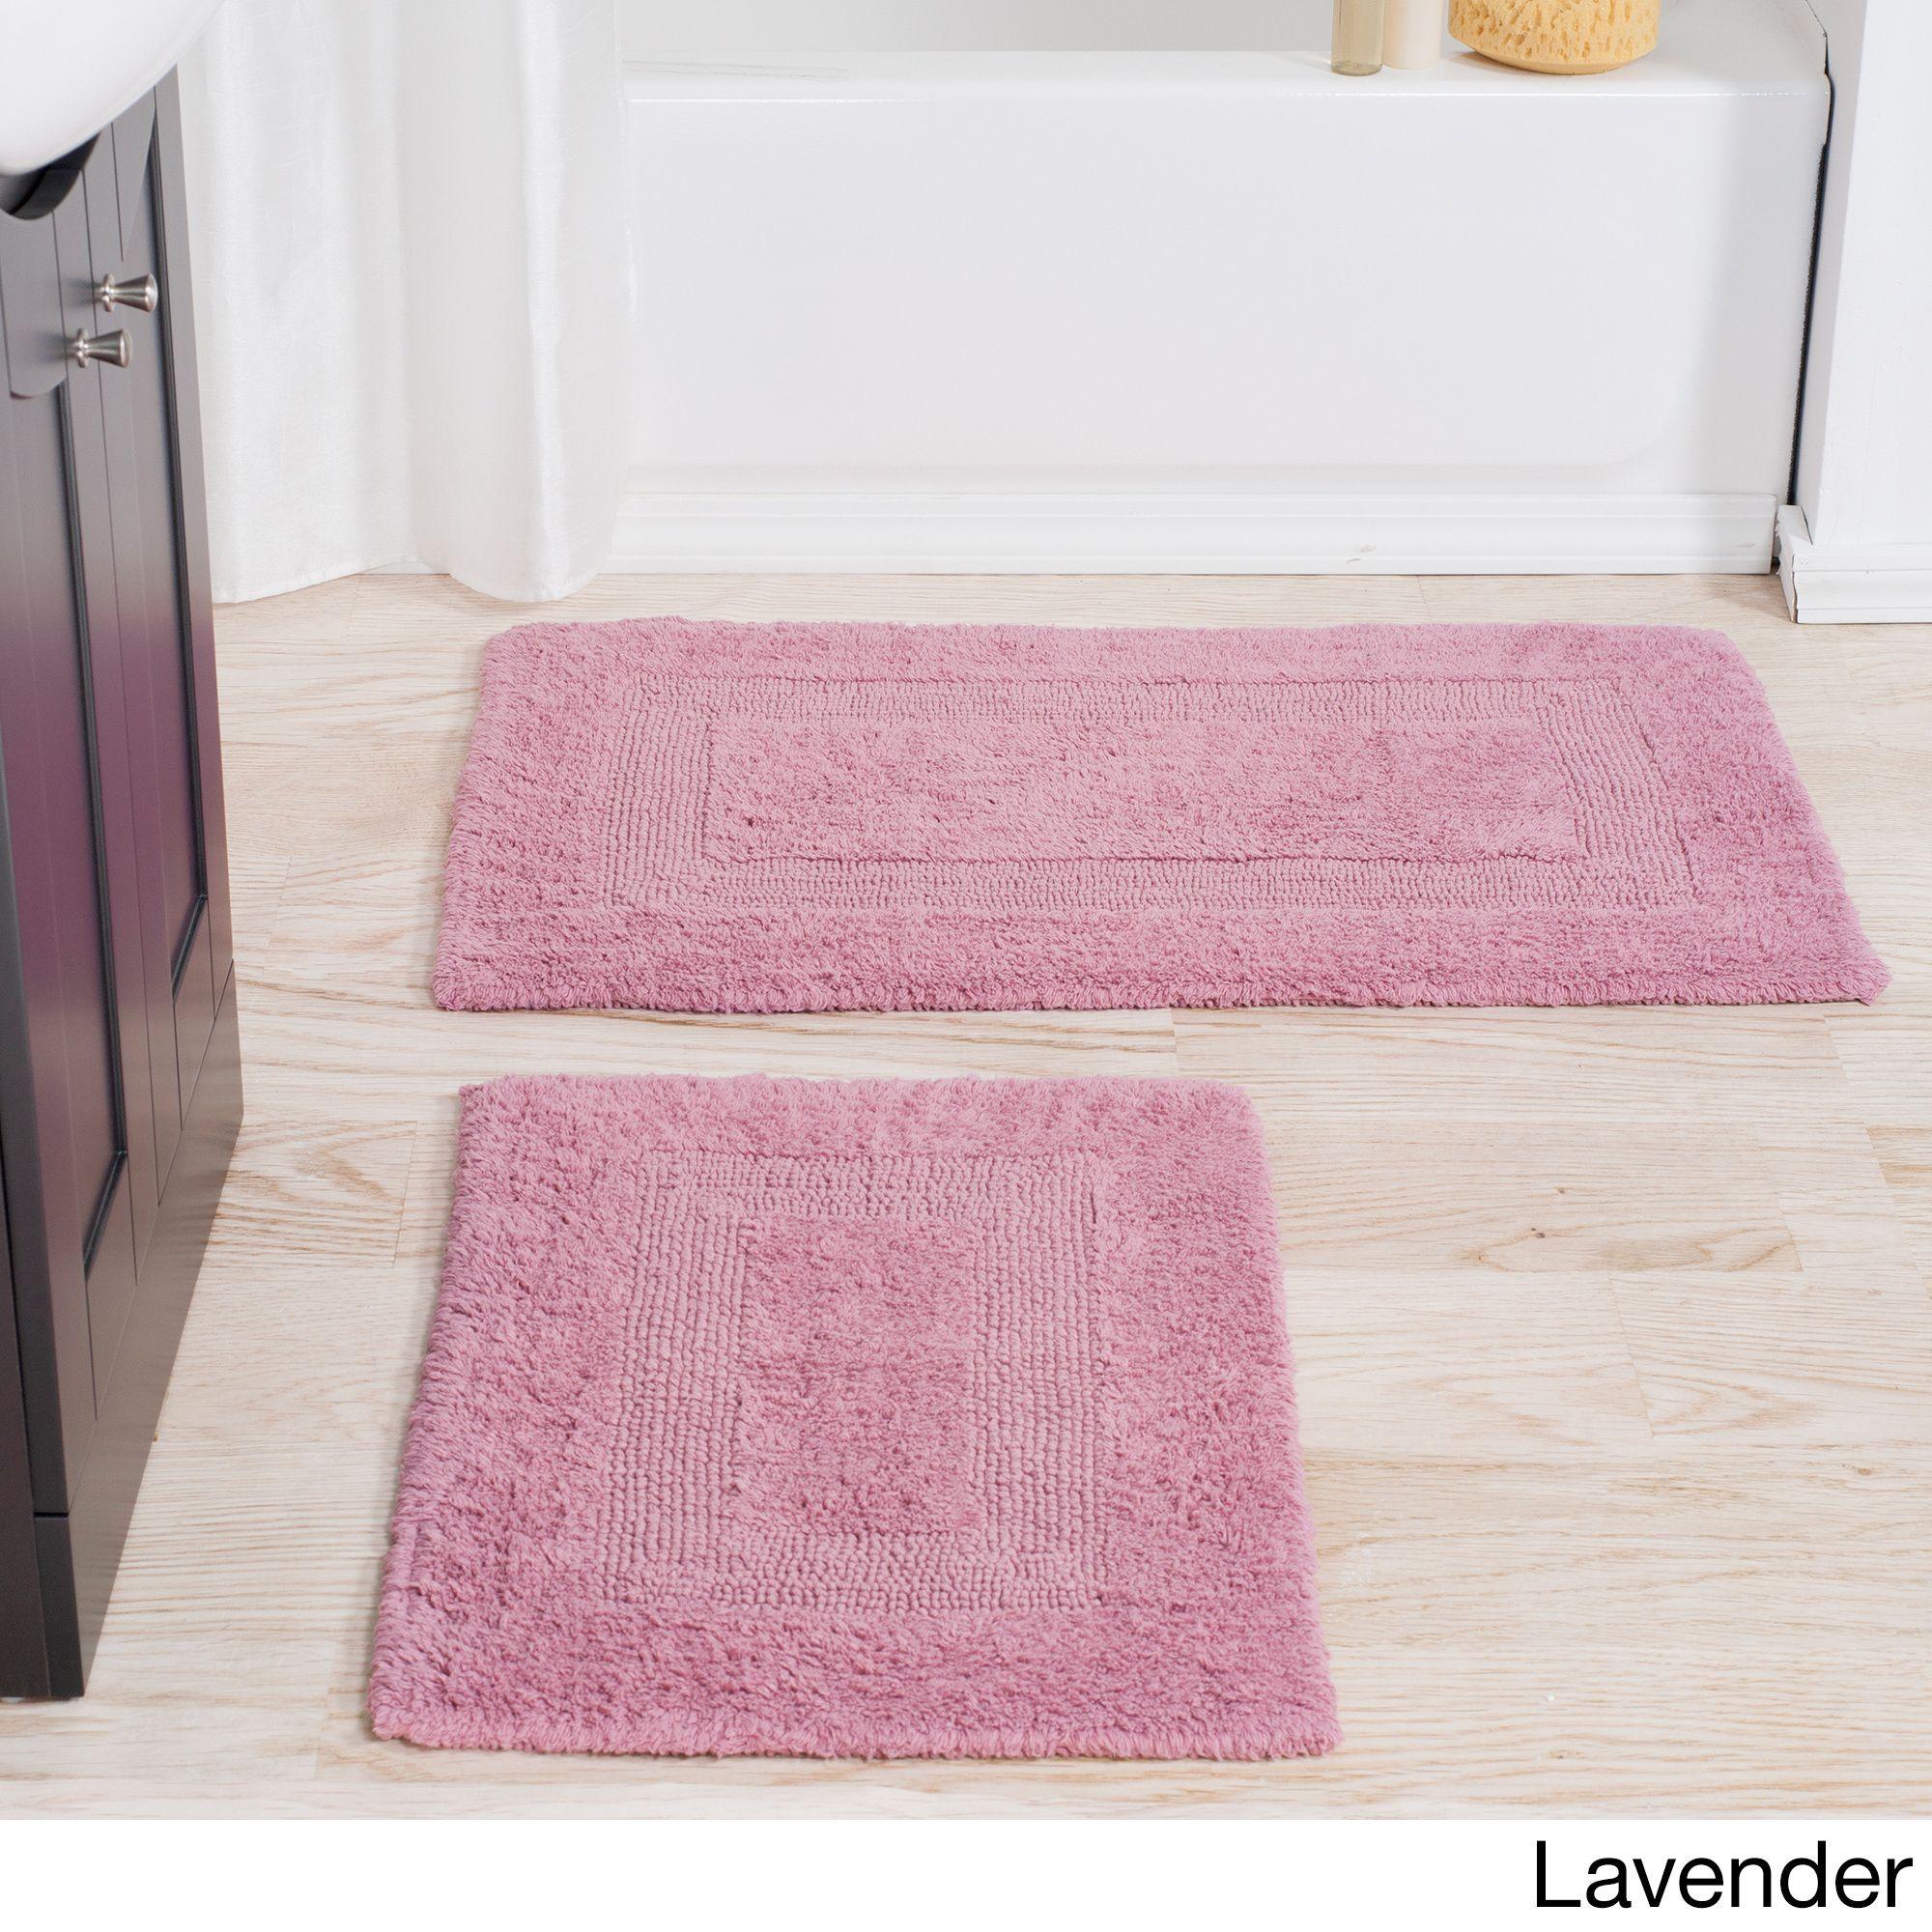 Windsor Home 100 Percent Cotton 2 Piece Reversible Rug Set Reversible Bath Rugs Bath Rugs Sets Rug Sets